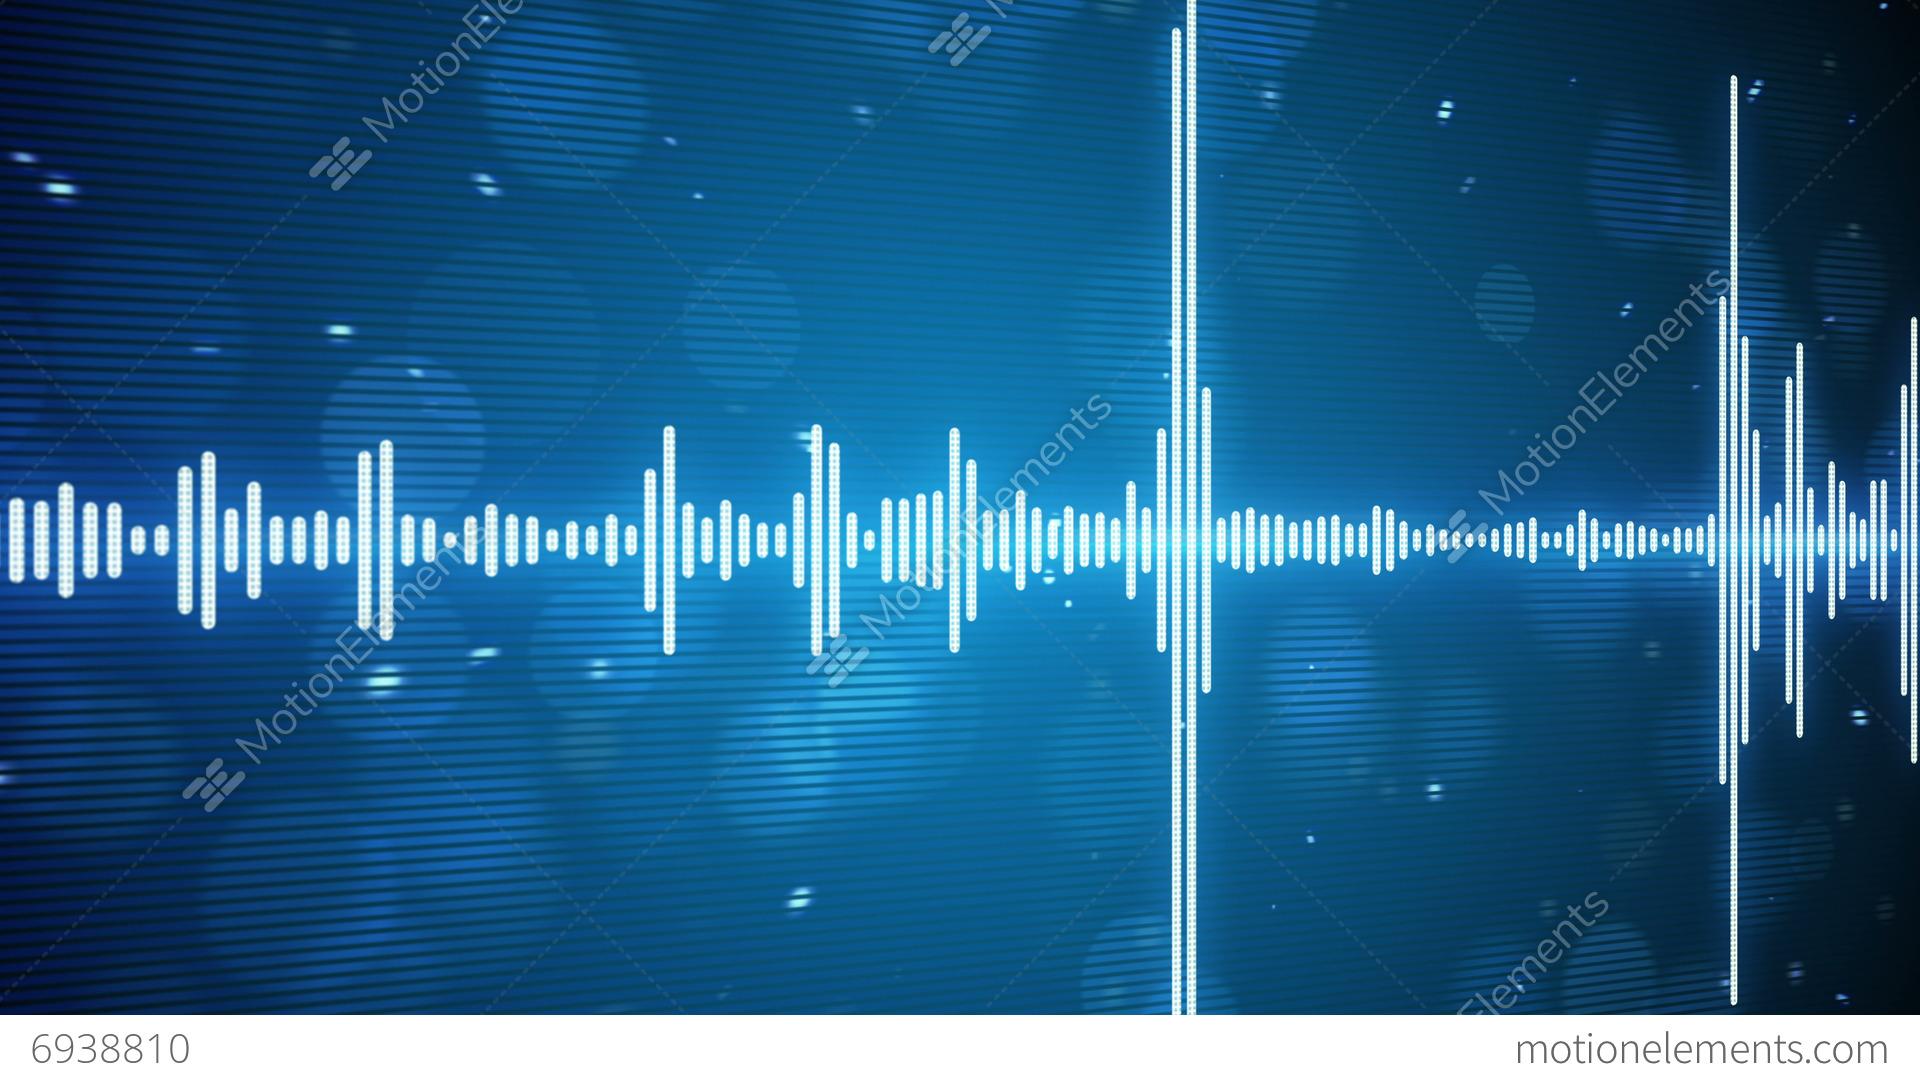 Music Equalizer Wallpaper: Music Equalizer Seamless Loop Background 4k (4096x2304